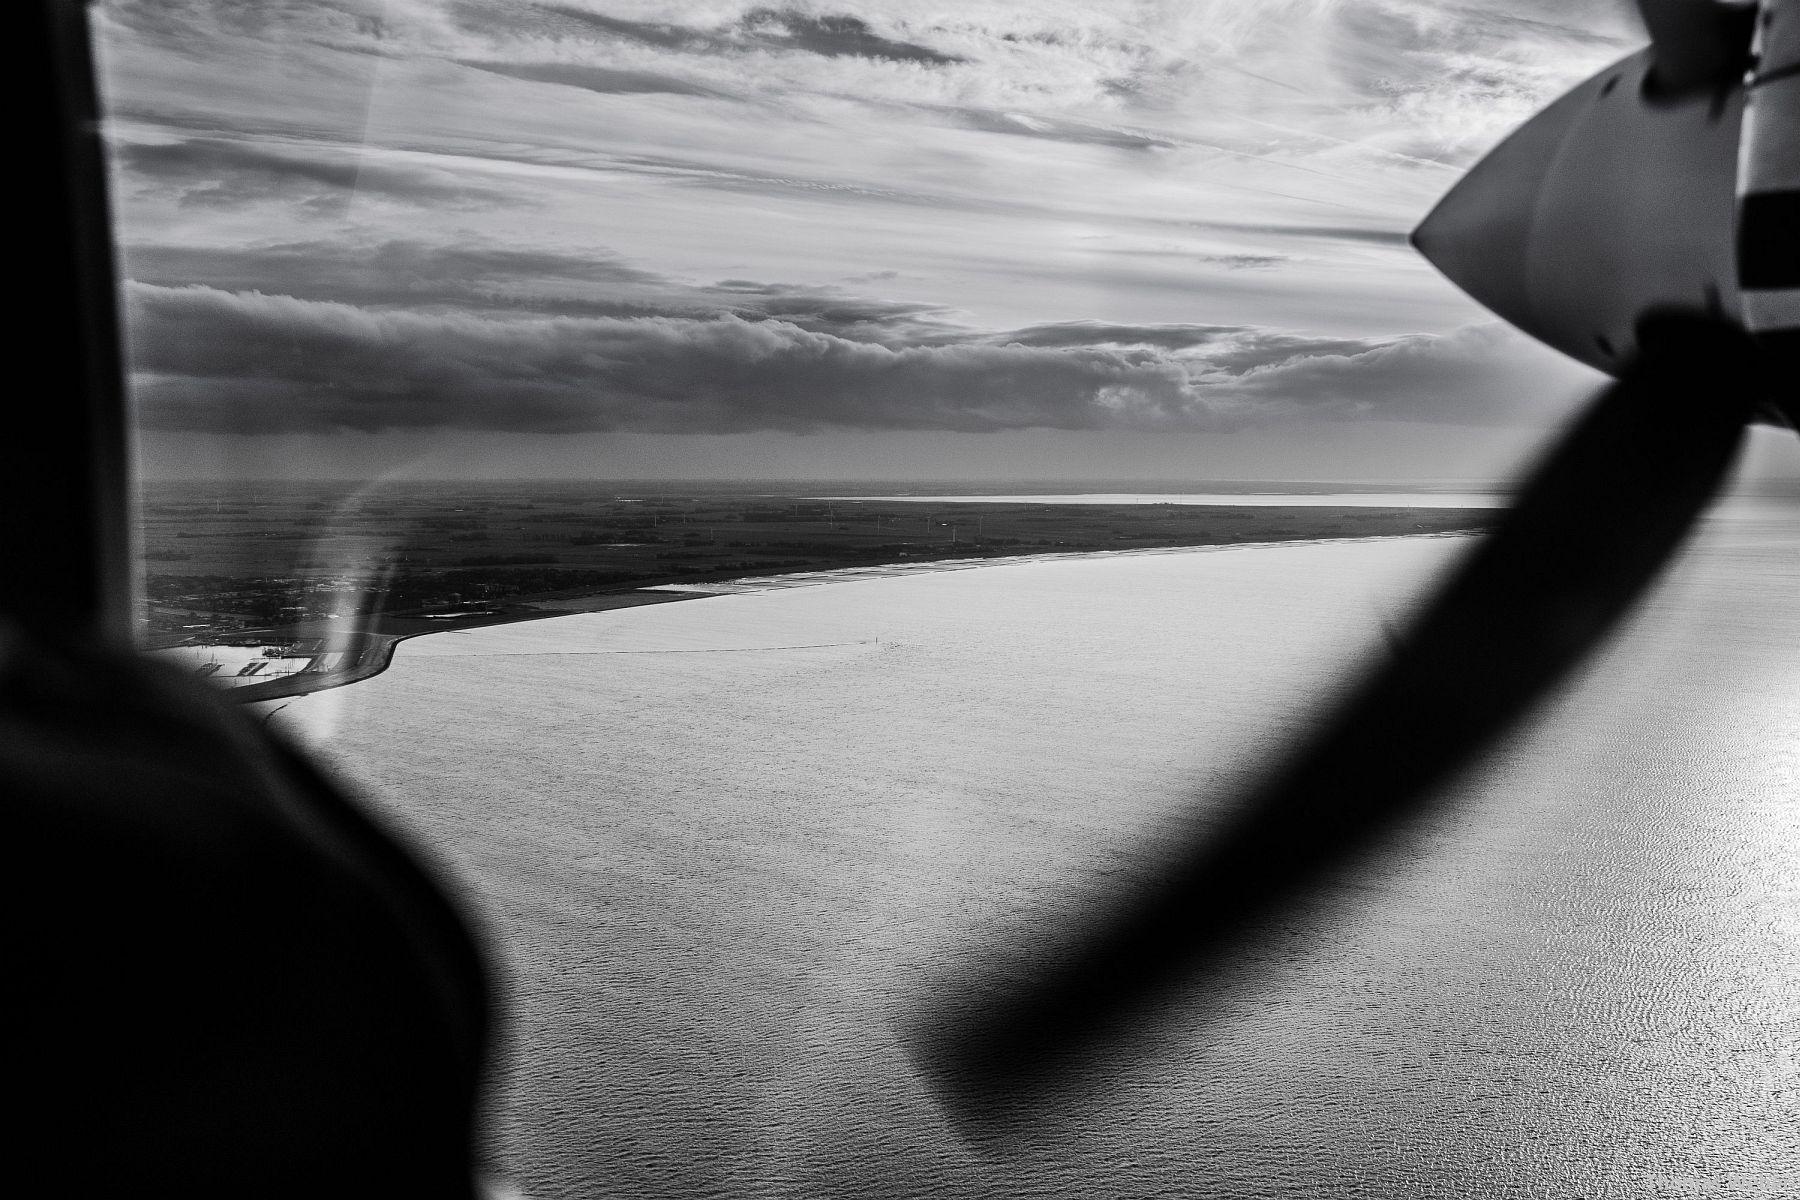 Fotograf Thomas Weber aus Oldenburg: Flucht vor dem Orkan Xaver mit dem Inselflieger Juist (9)